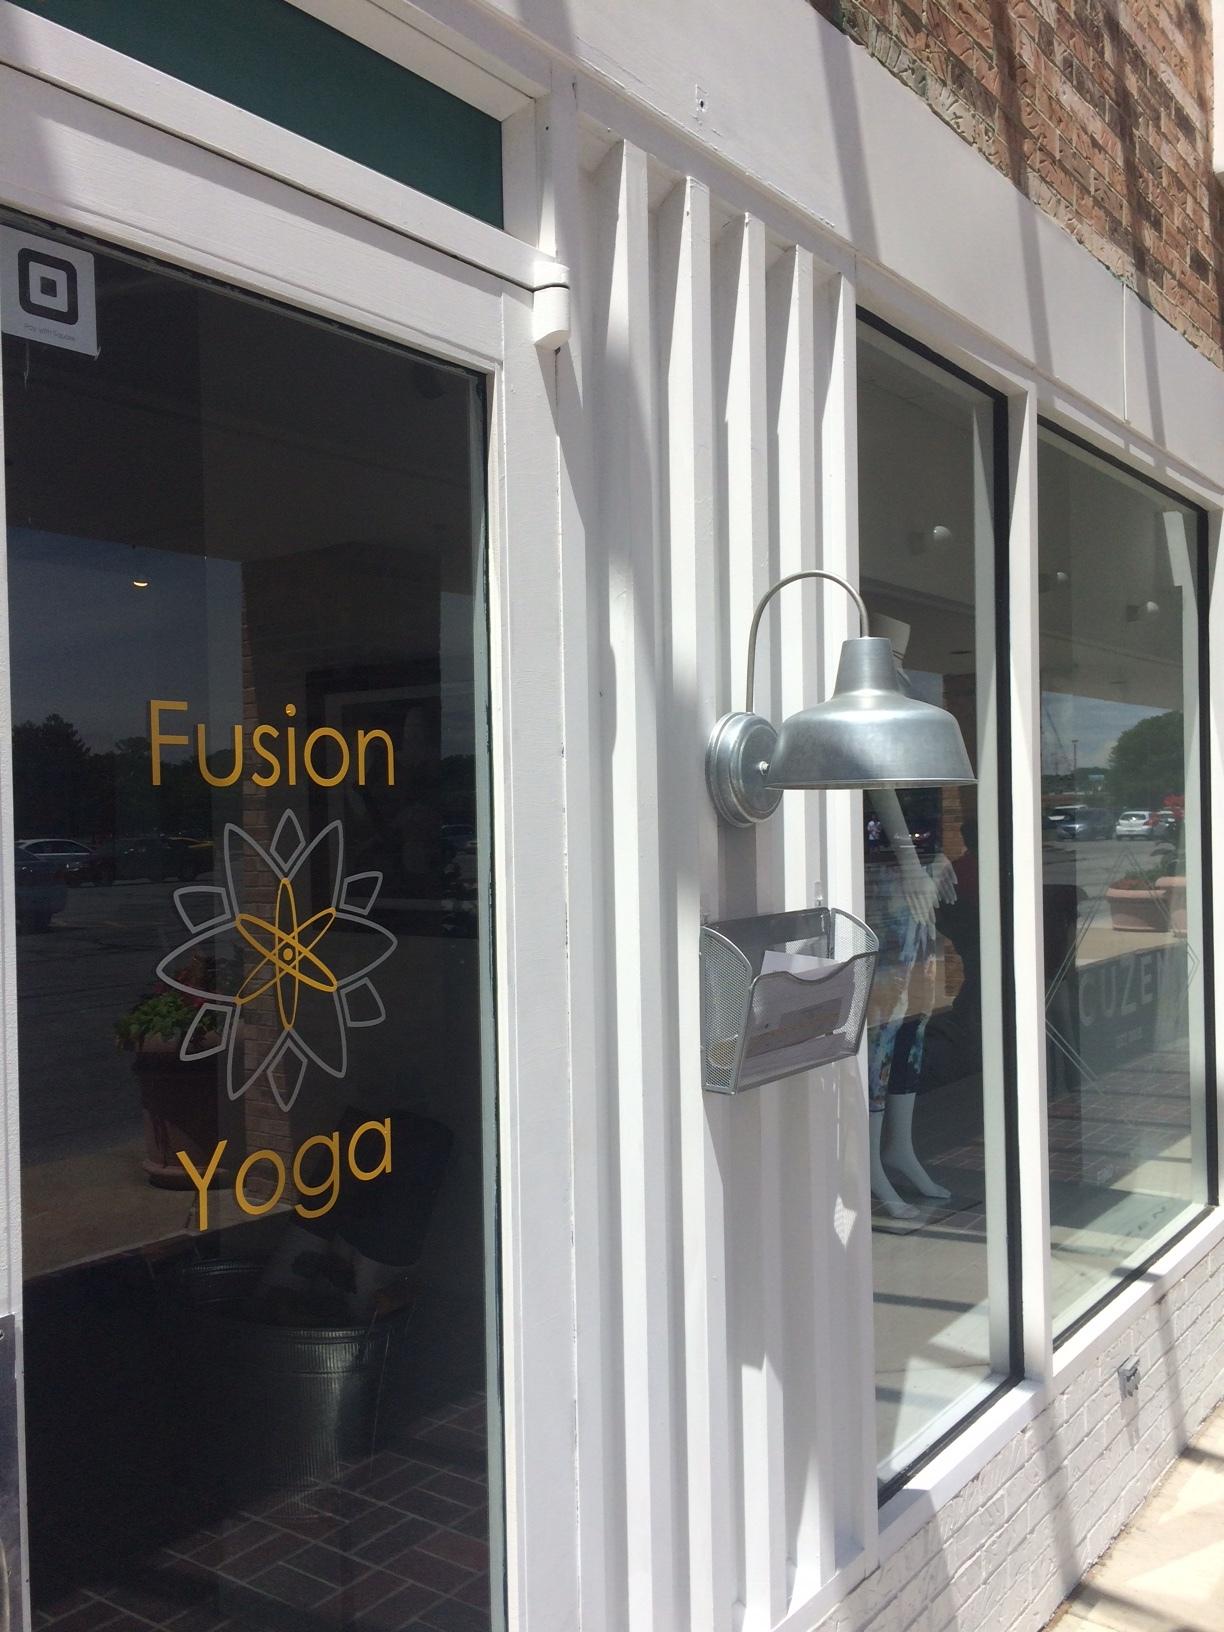 Fusion Yoga Entrance